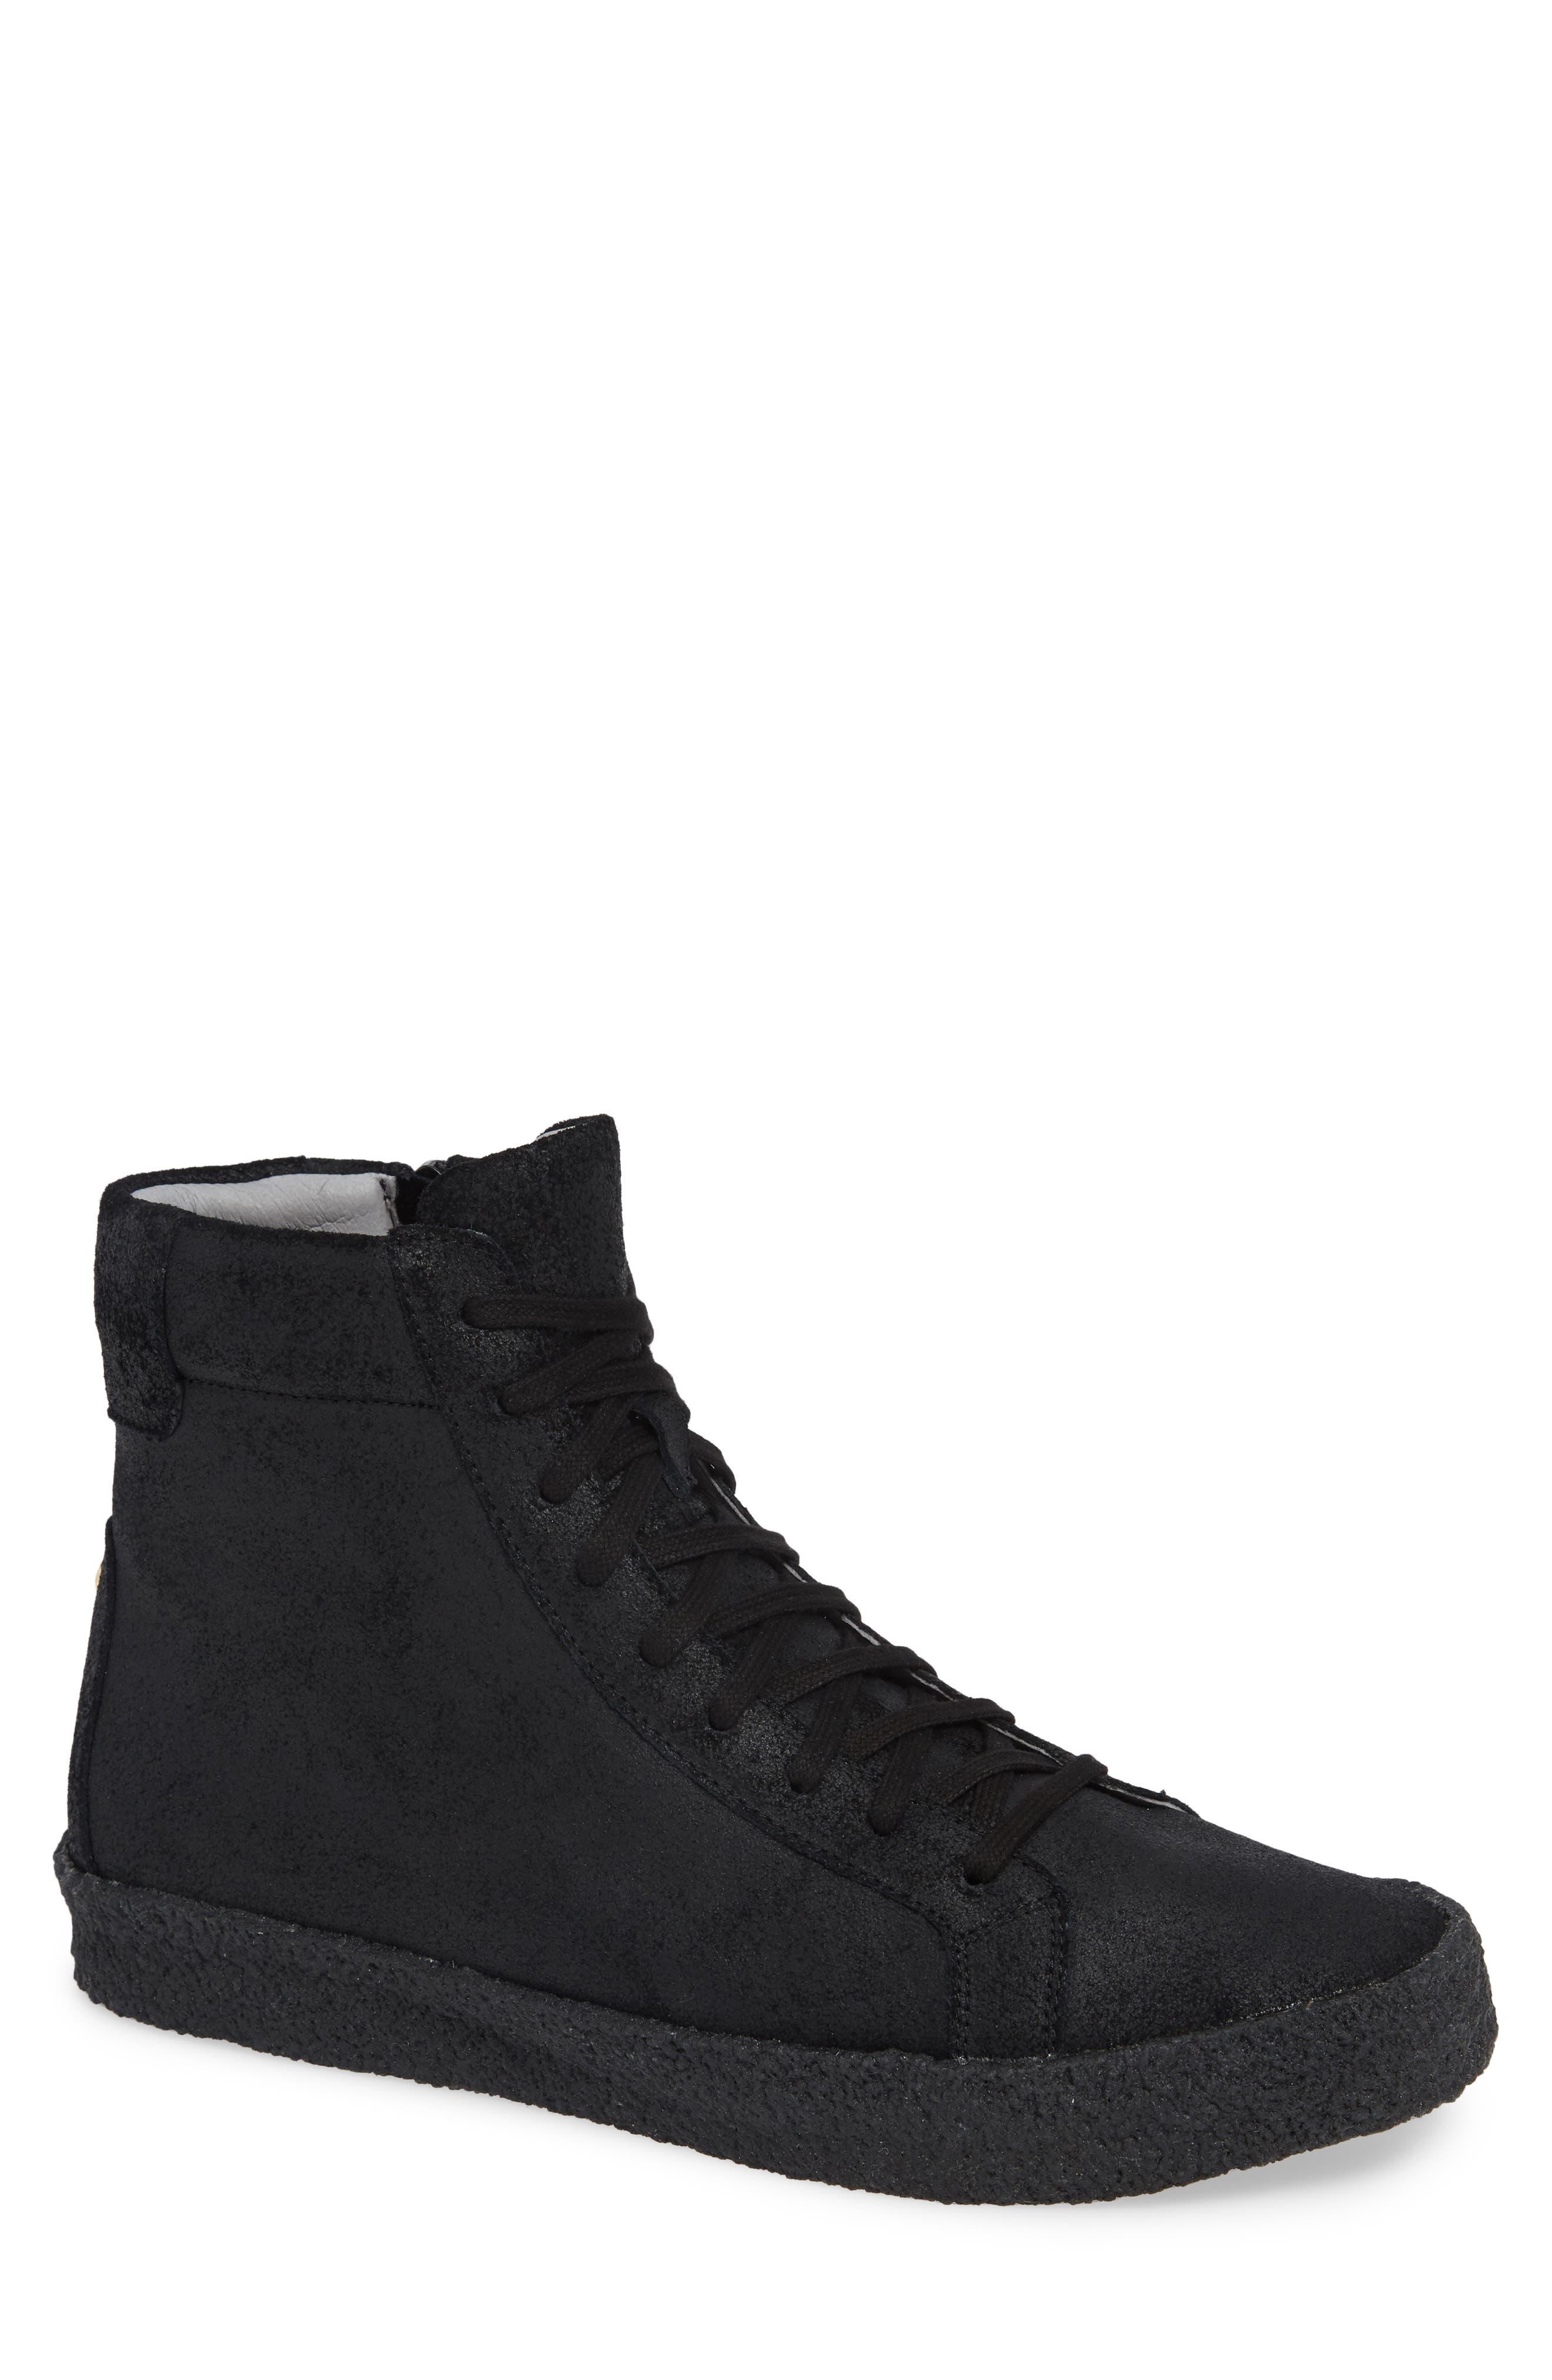 Apa High Top Sneaker,                         Main,                         color, TRIPLE BLACK LEATHER